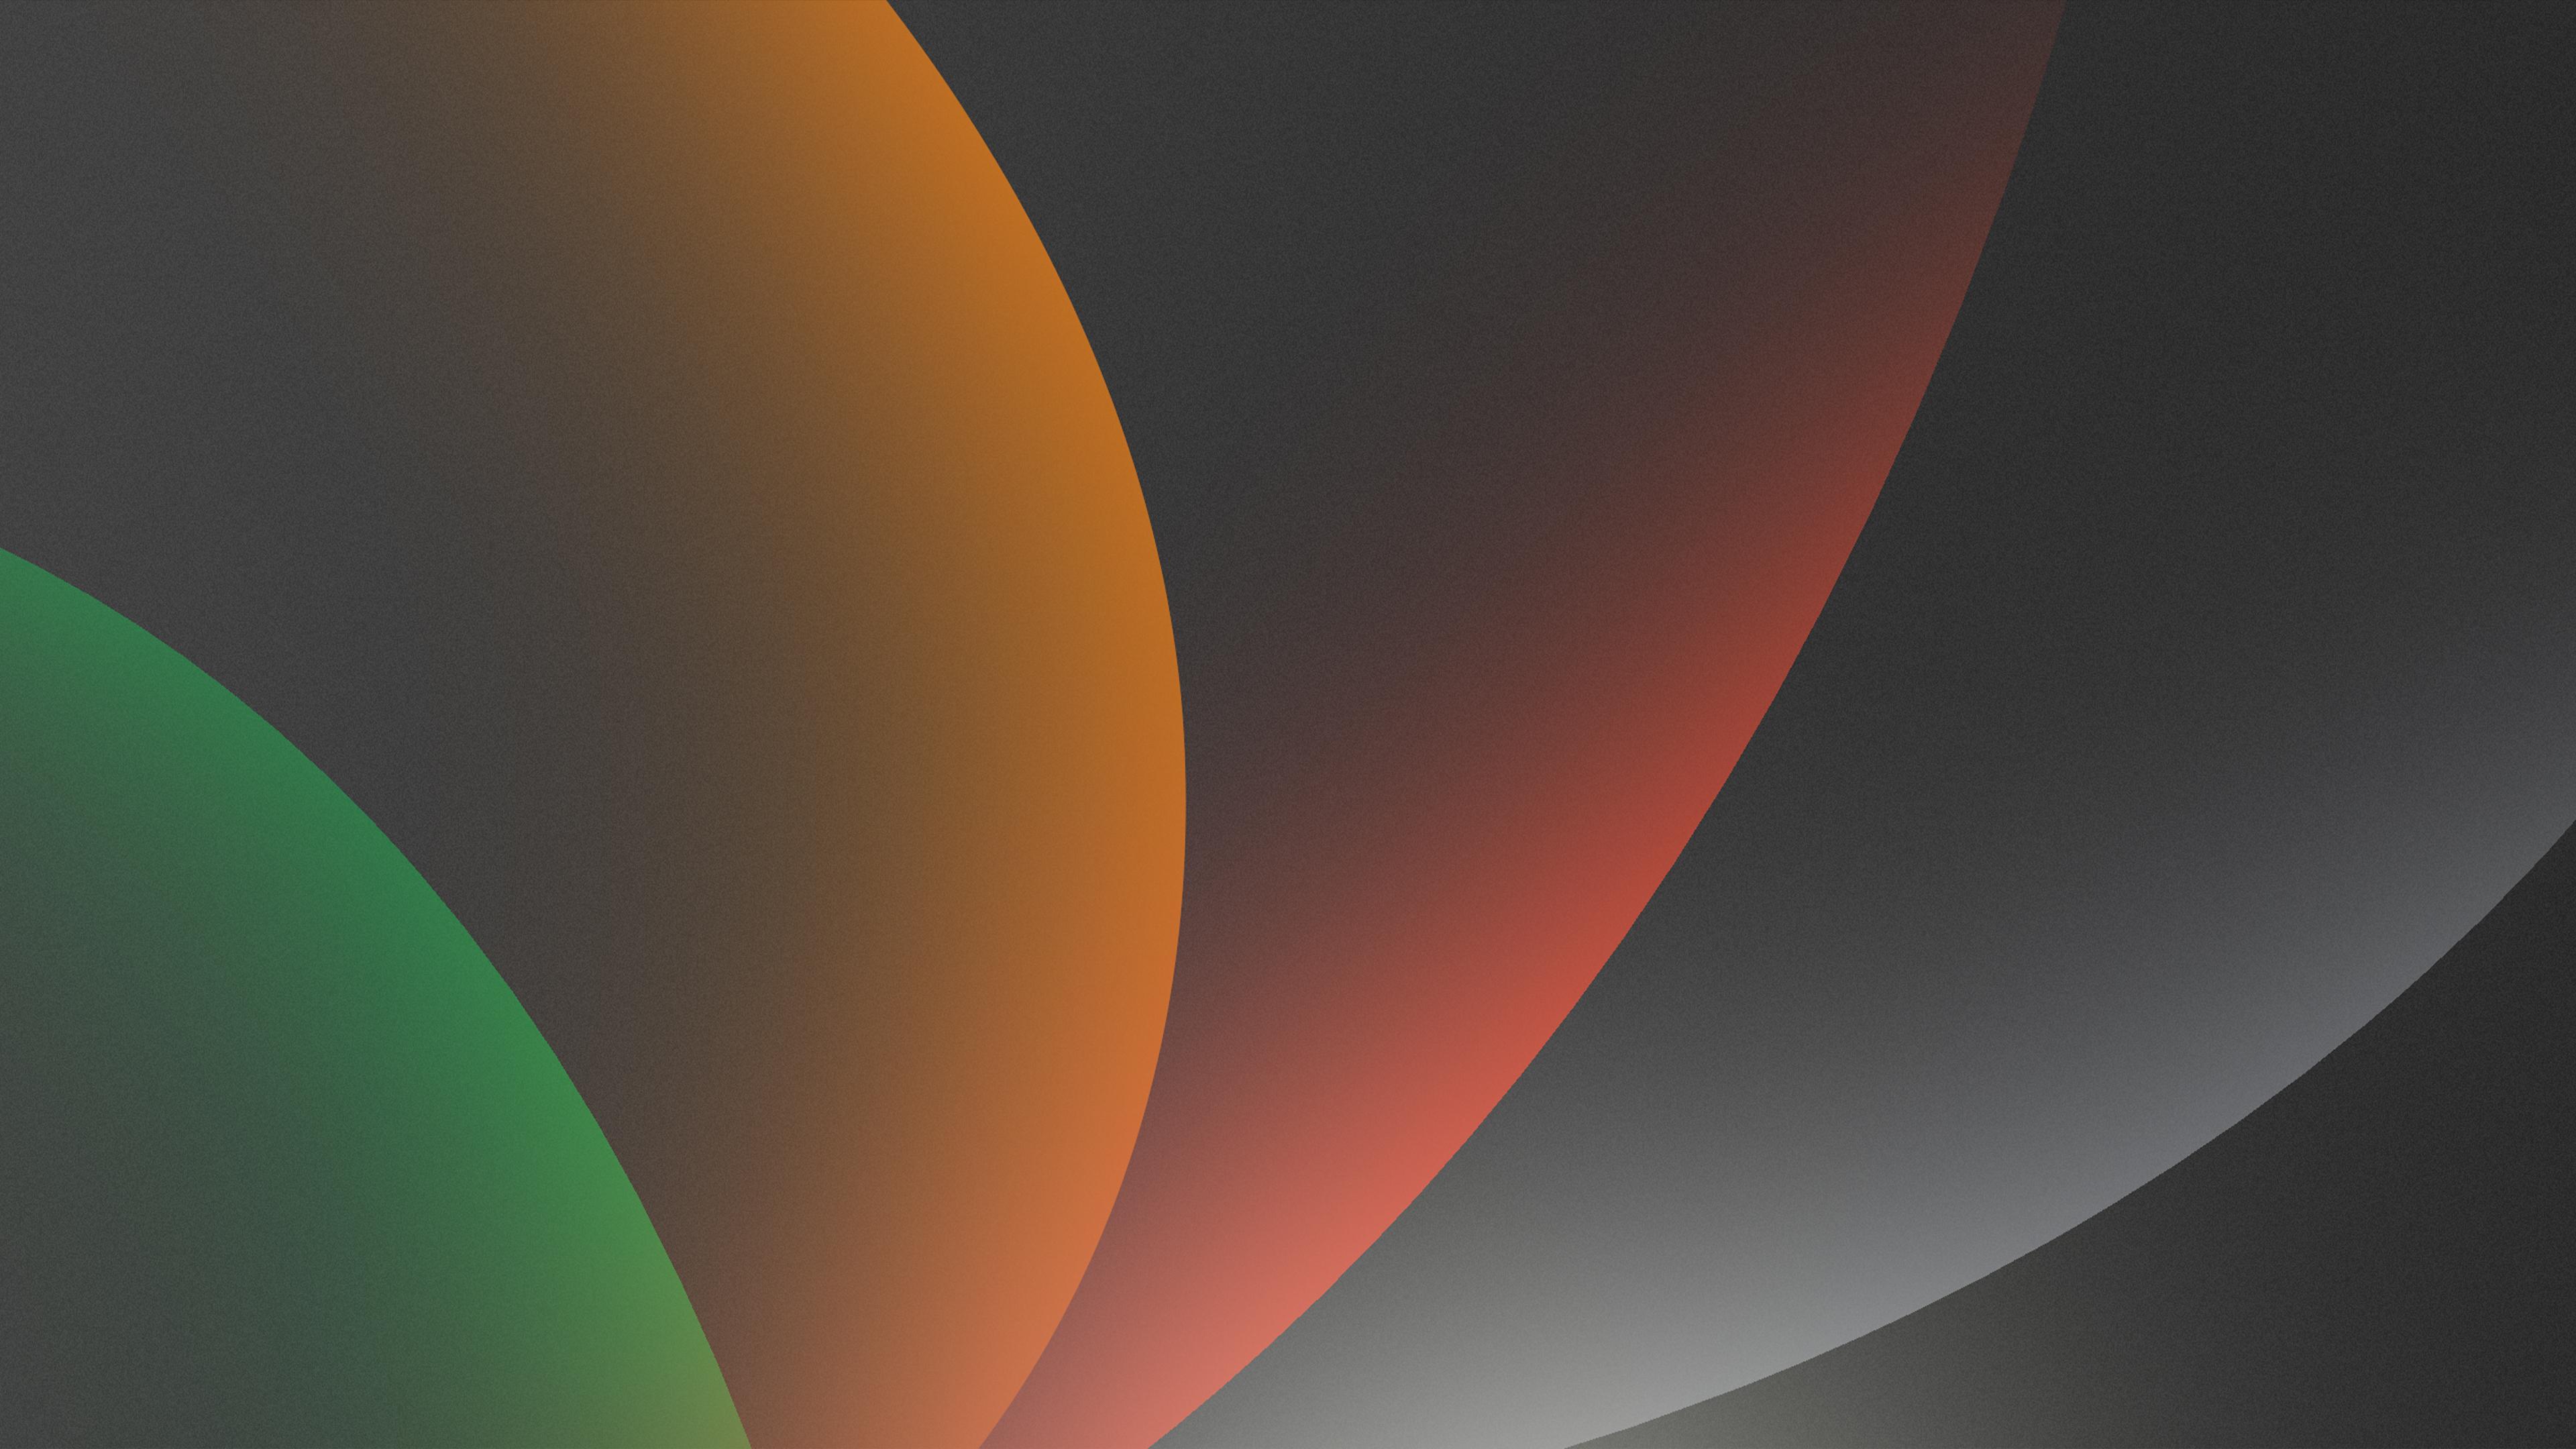 geometric curves 1575660275 - Geometric Curves -